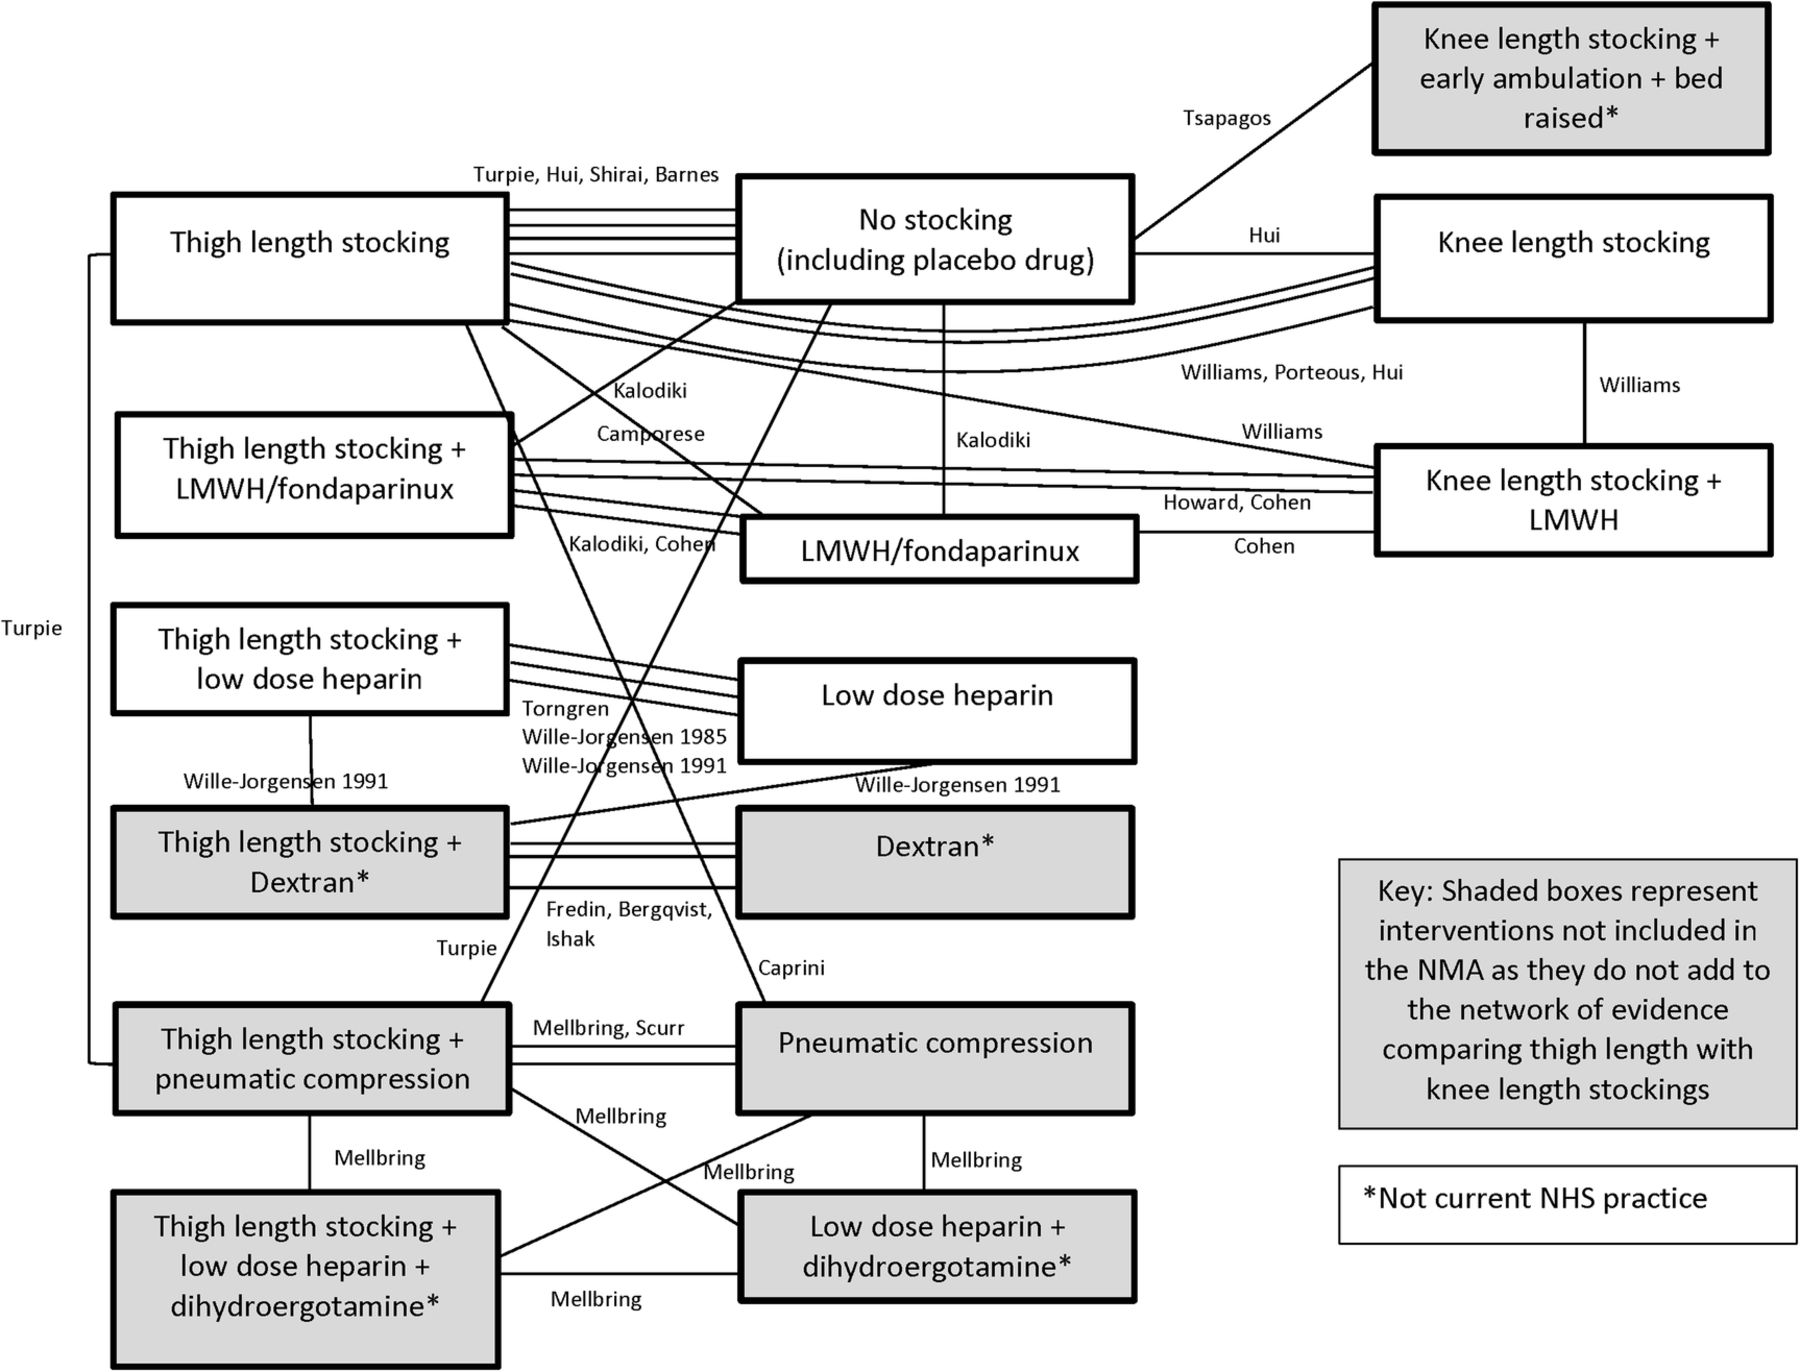 Thigh Length Versus Knee Length Antiembolism Stockings For